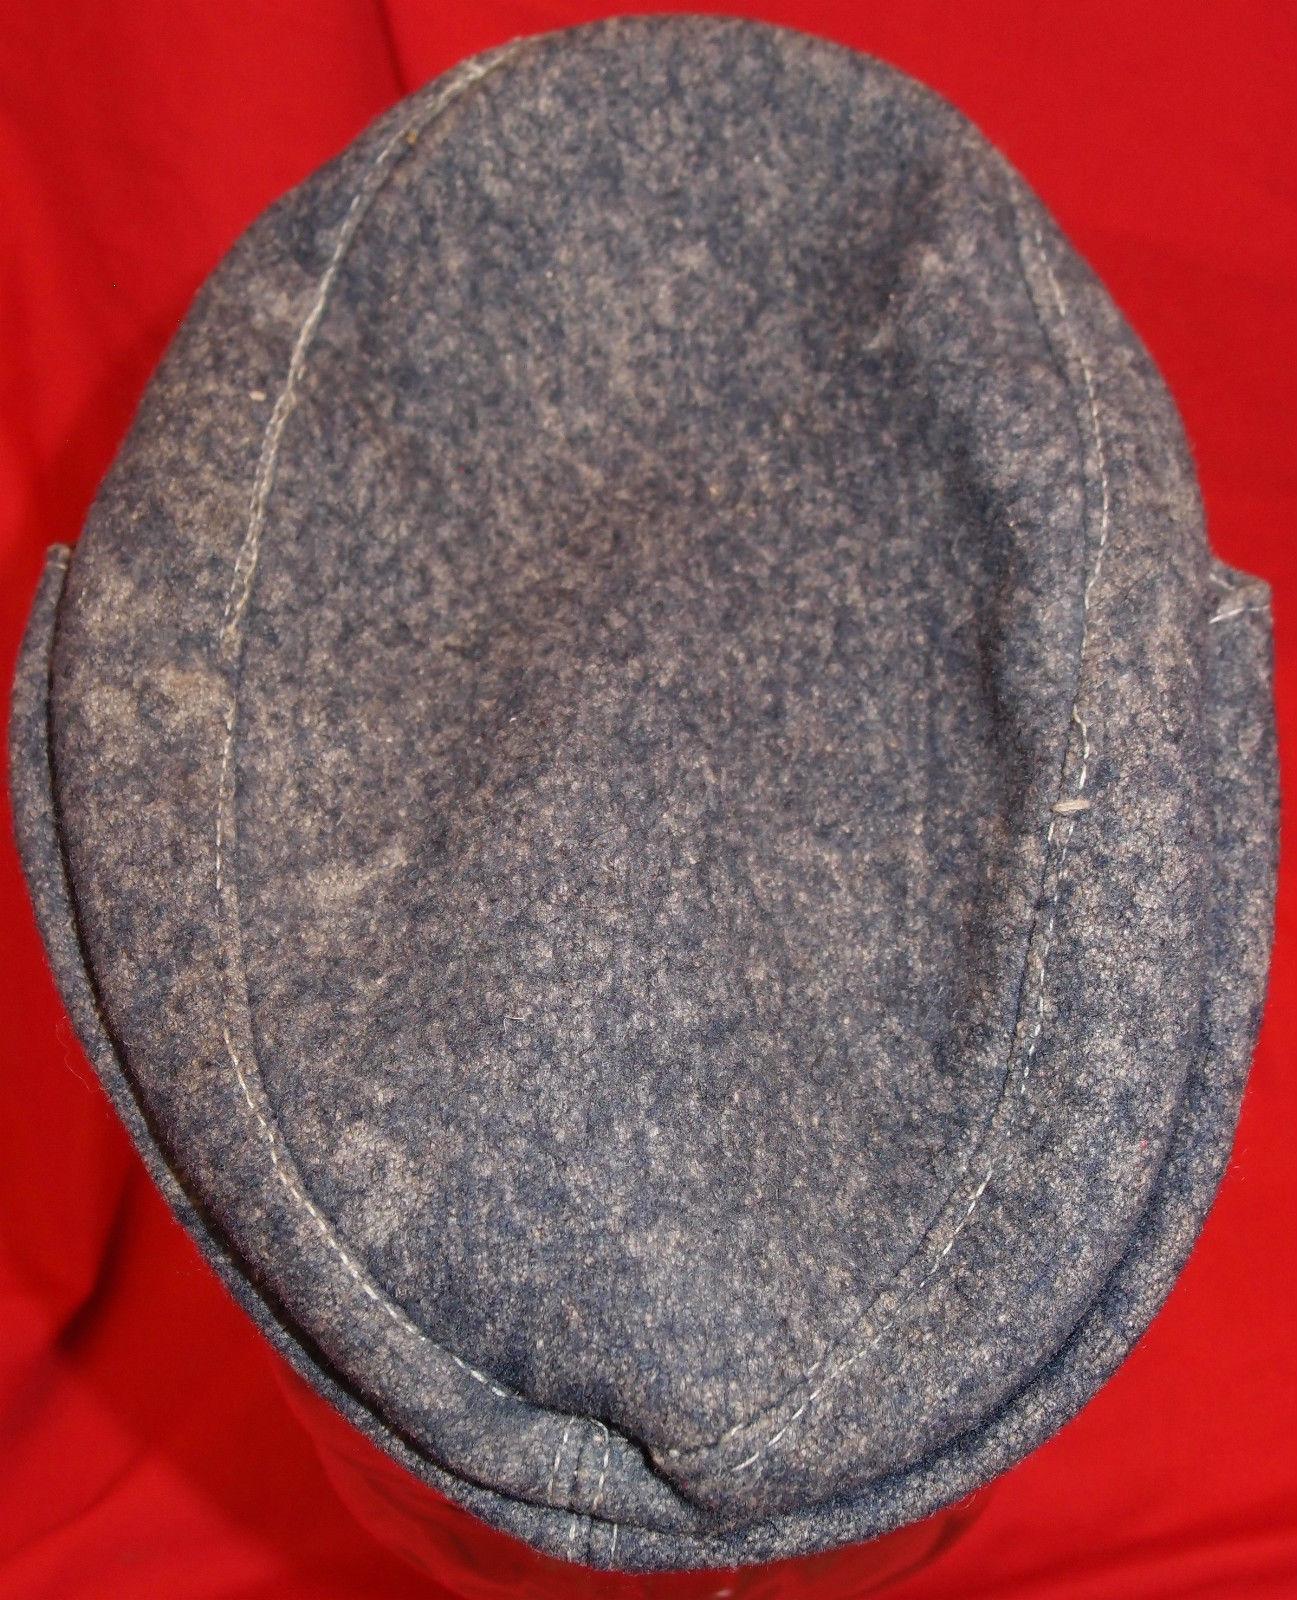 Ww2 German Police M43 Hat Badge: WW2 GERMAN LUFTWAFFE M43 ENLISTED FIELD CAP